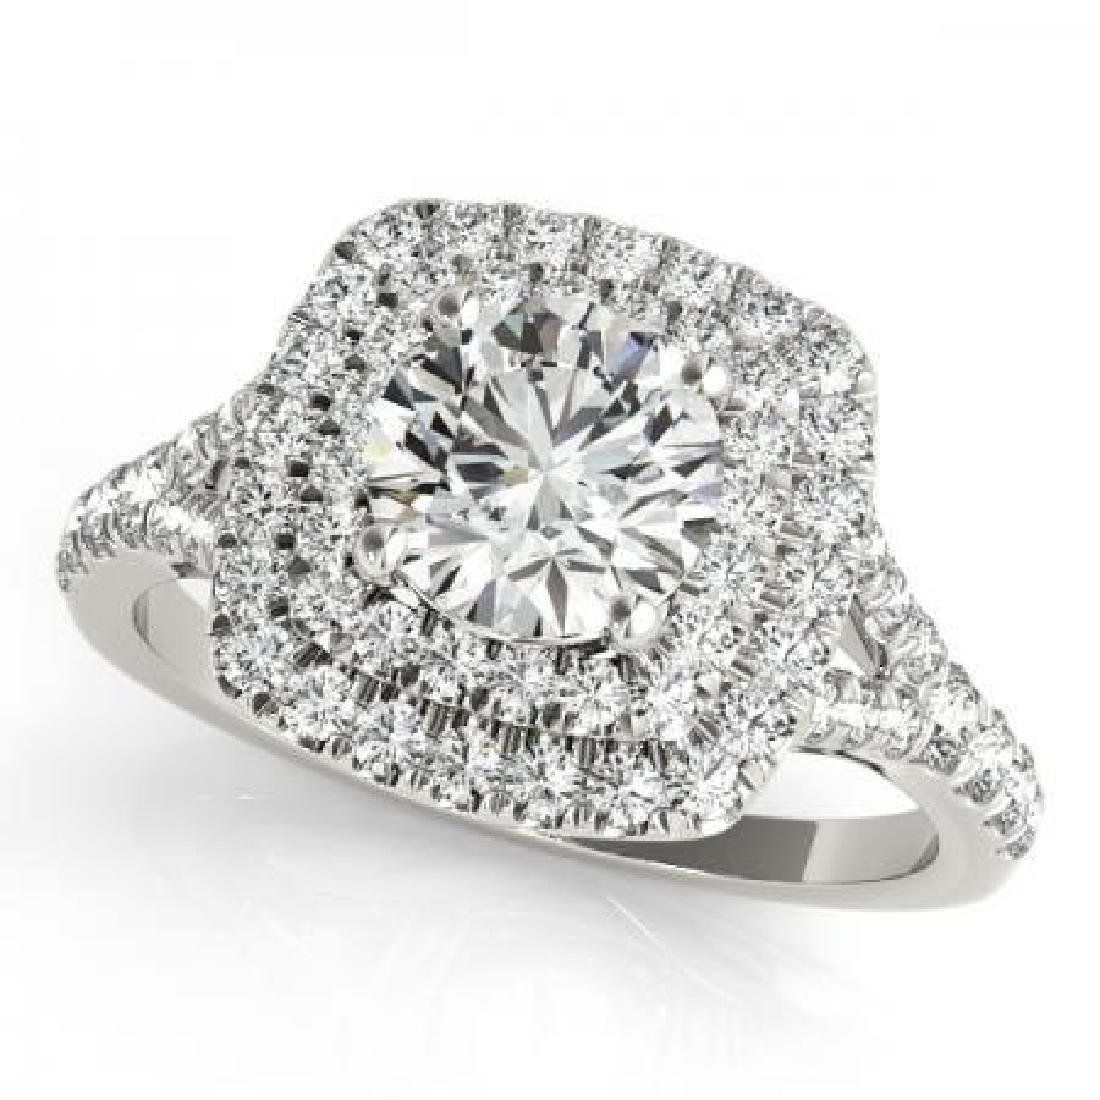 CERTIFIED 14KT WHITE GOLD 1.11 CT G-H/VS-SI1 DIAMOND HA